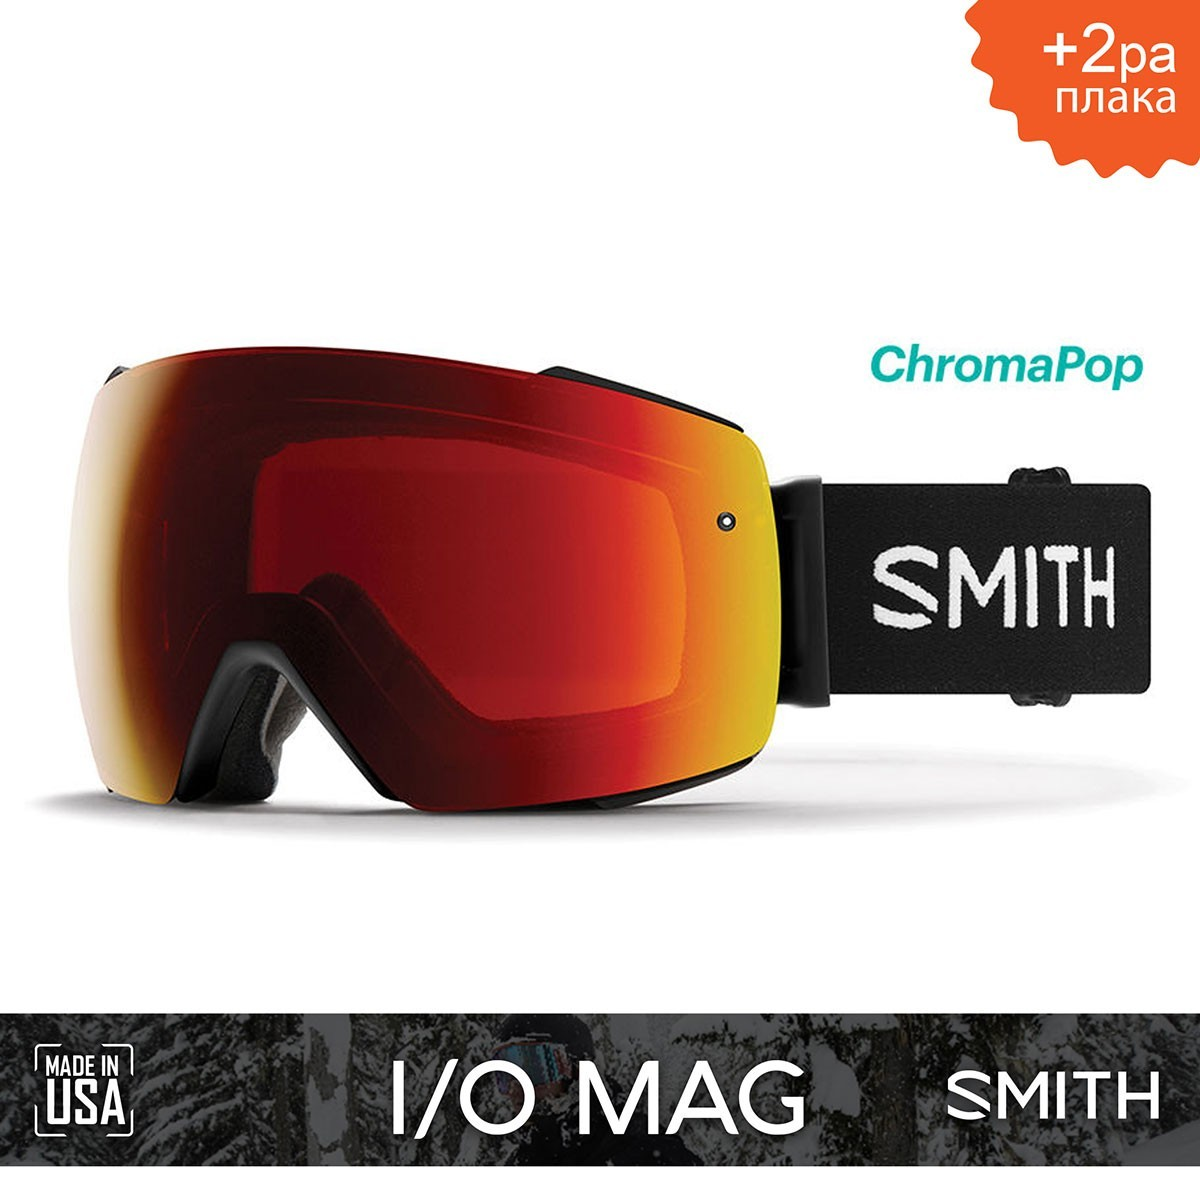 SMITH IO MAG Black | S3 CHROMAPOP Sun Red Mirror - Изображение - AQUAMATRIX